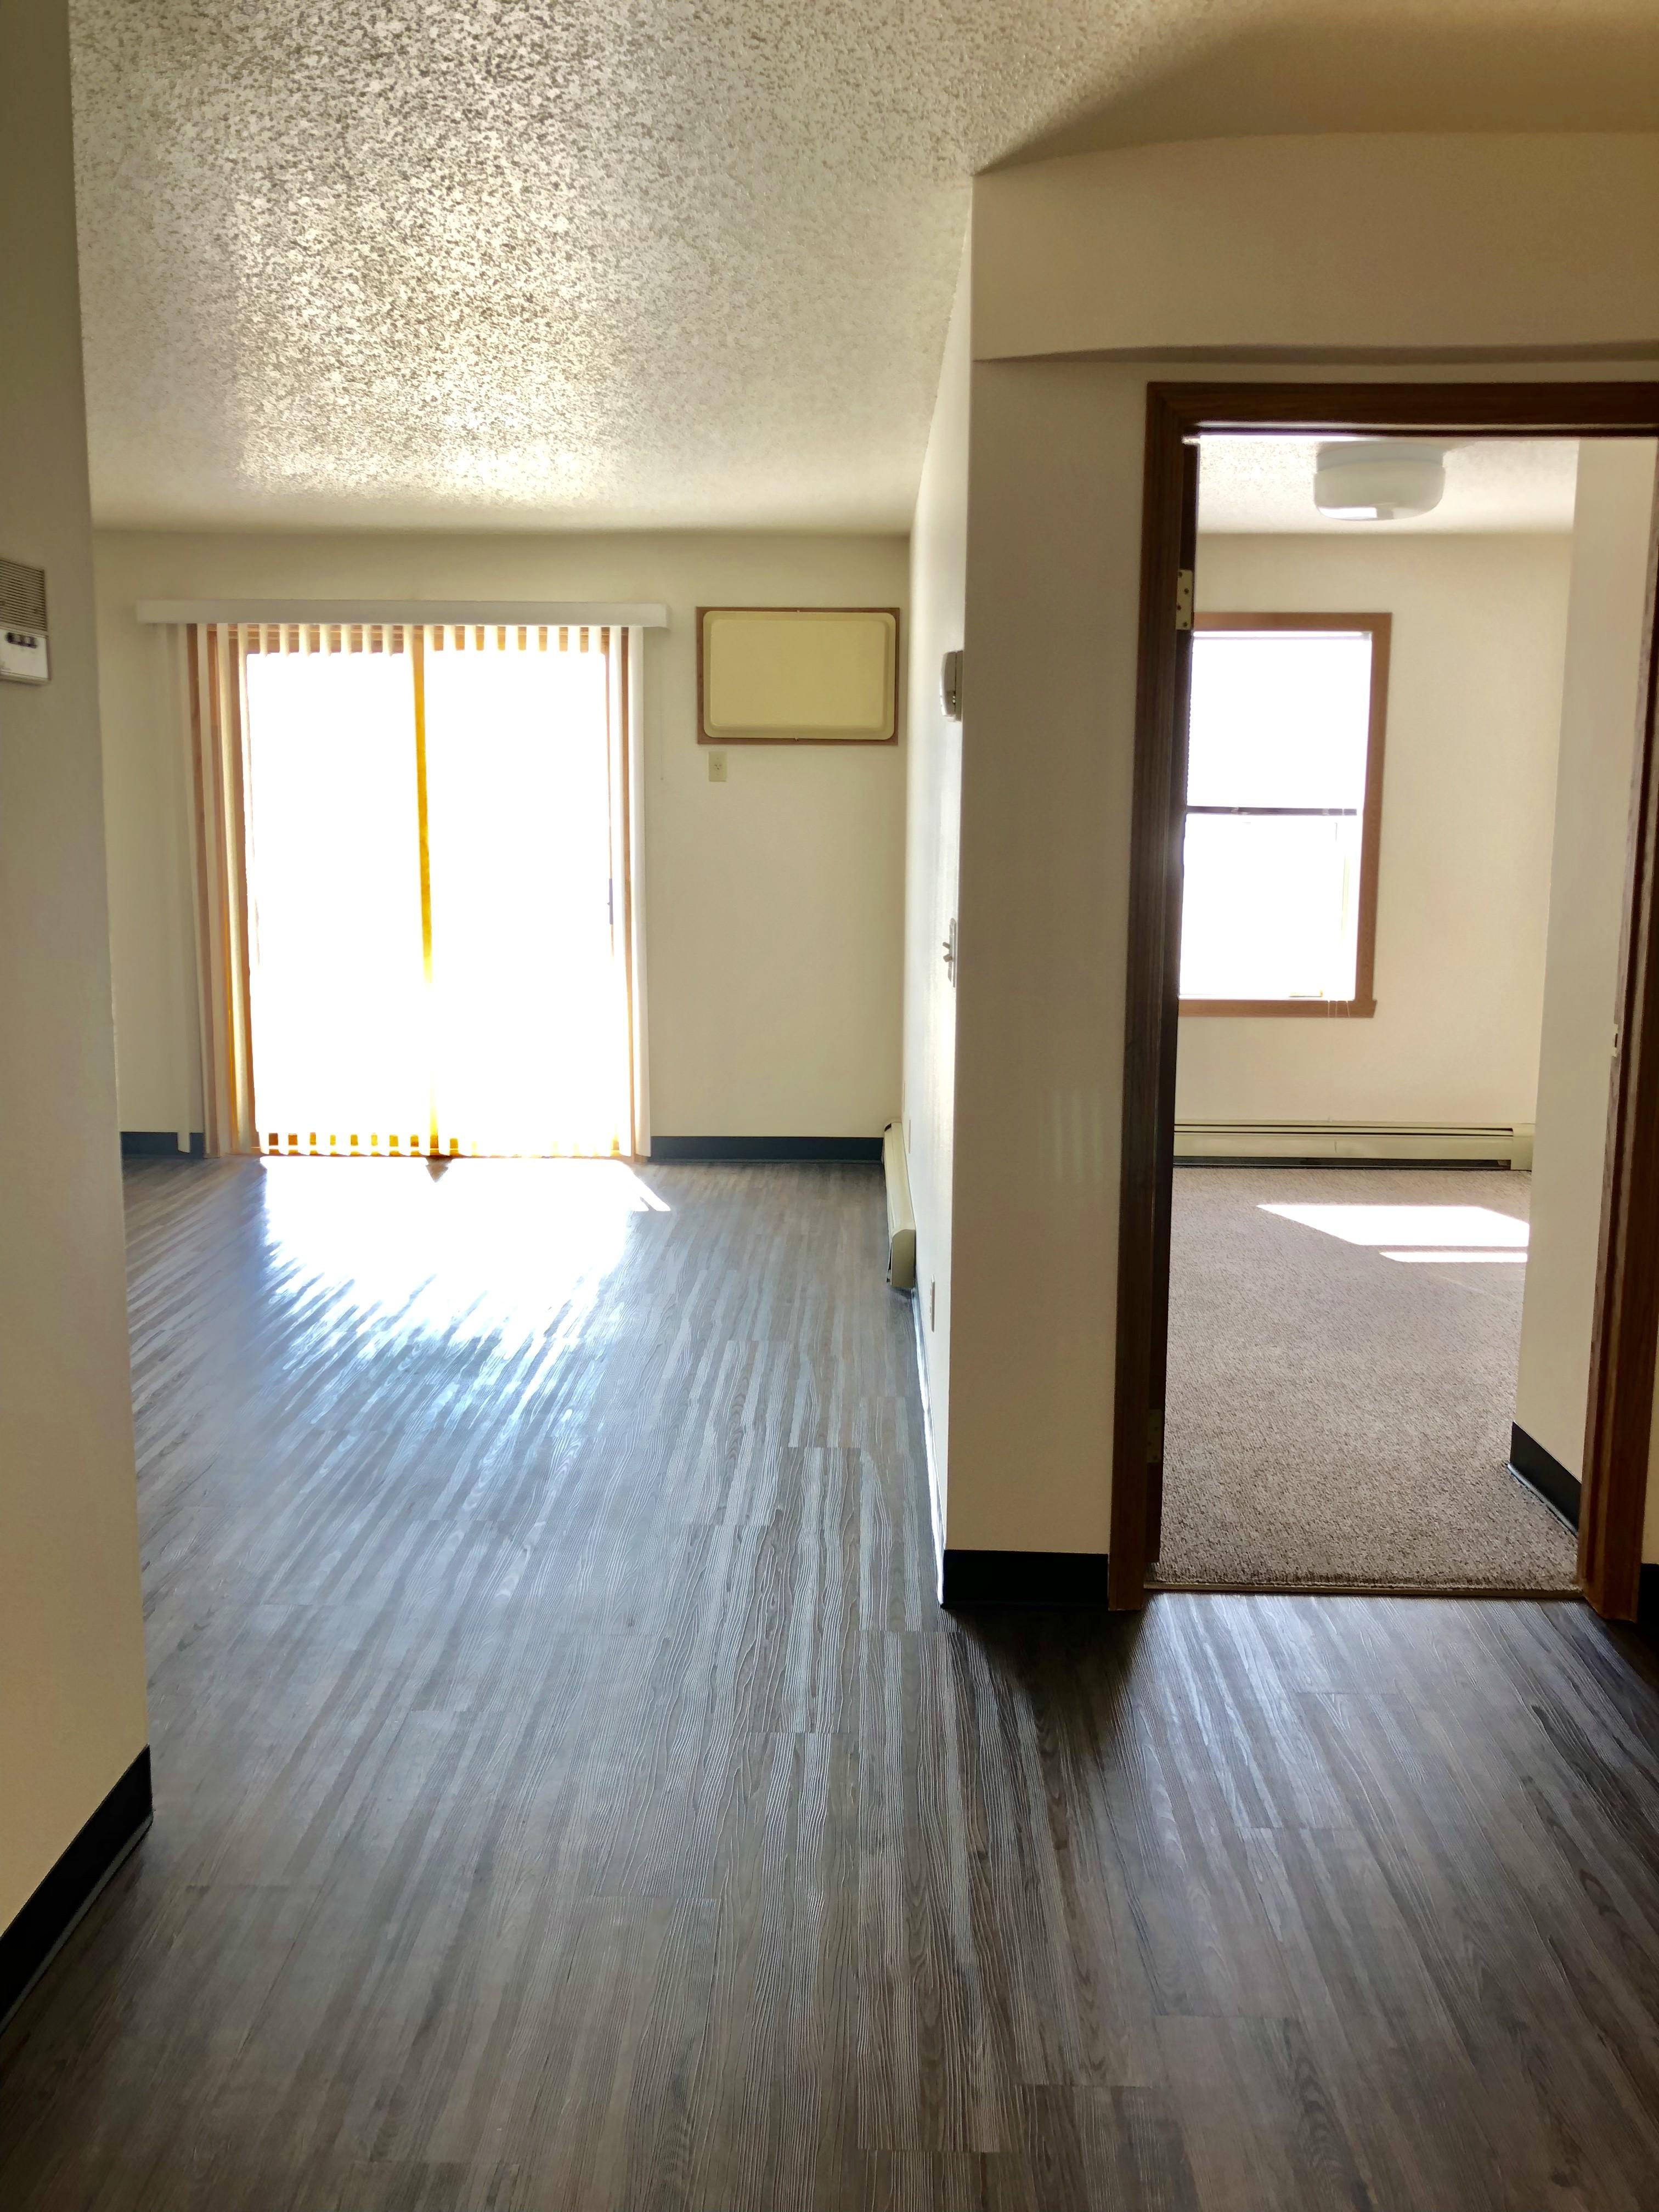 Apartments Near NDSU Trollwood Village Apartments for North Dakota State University Students in Fargo, ND